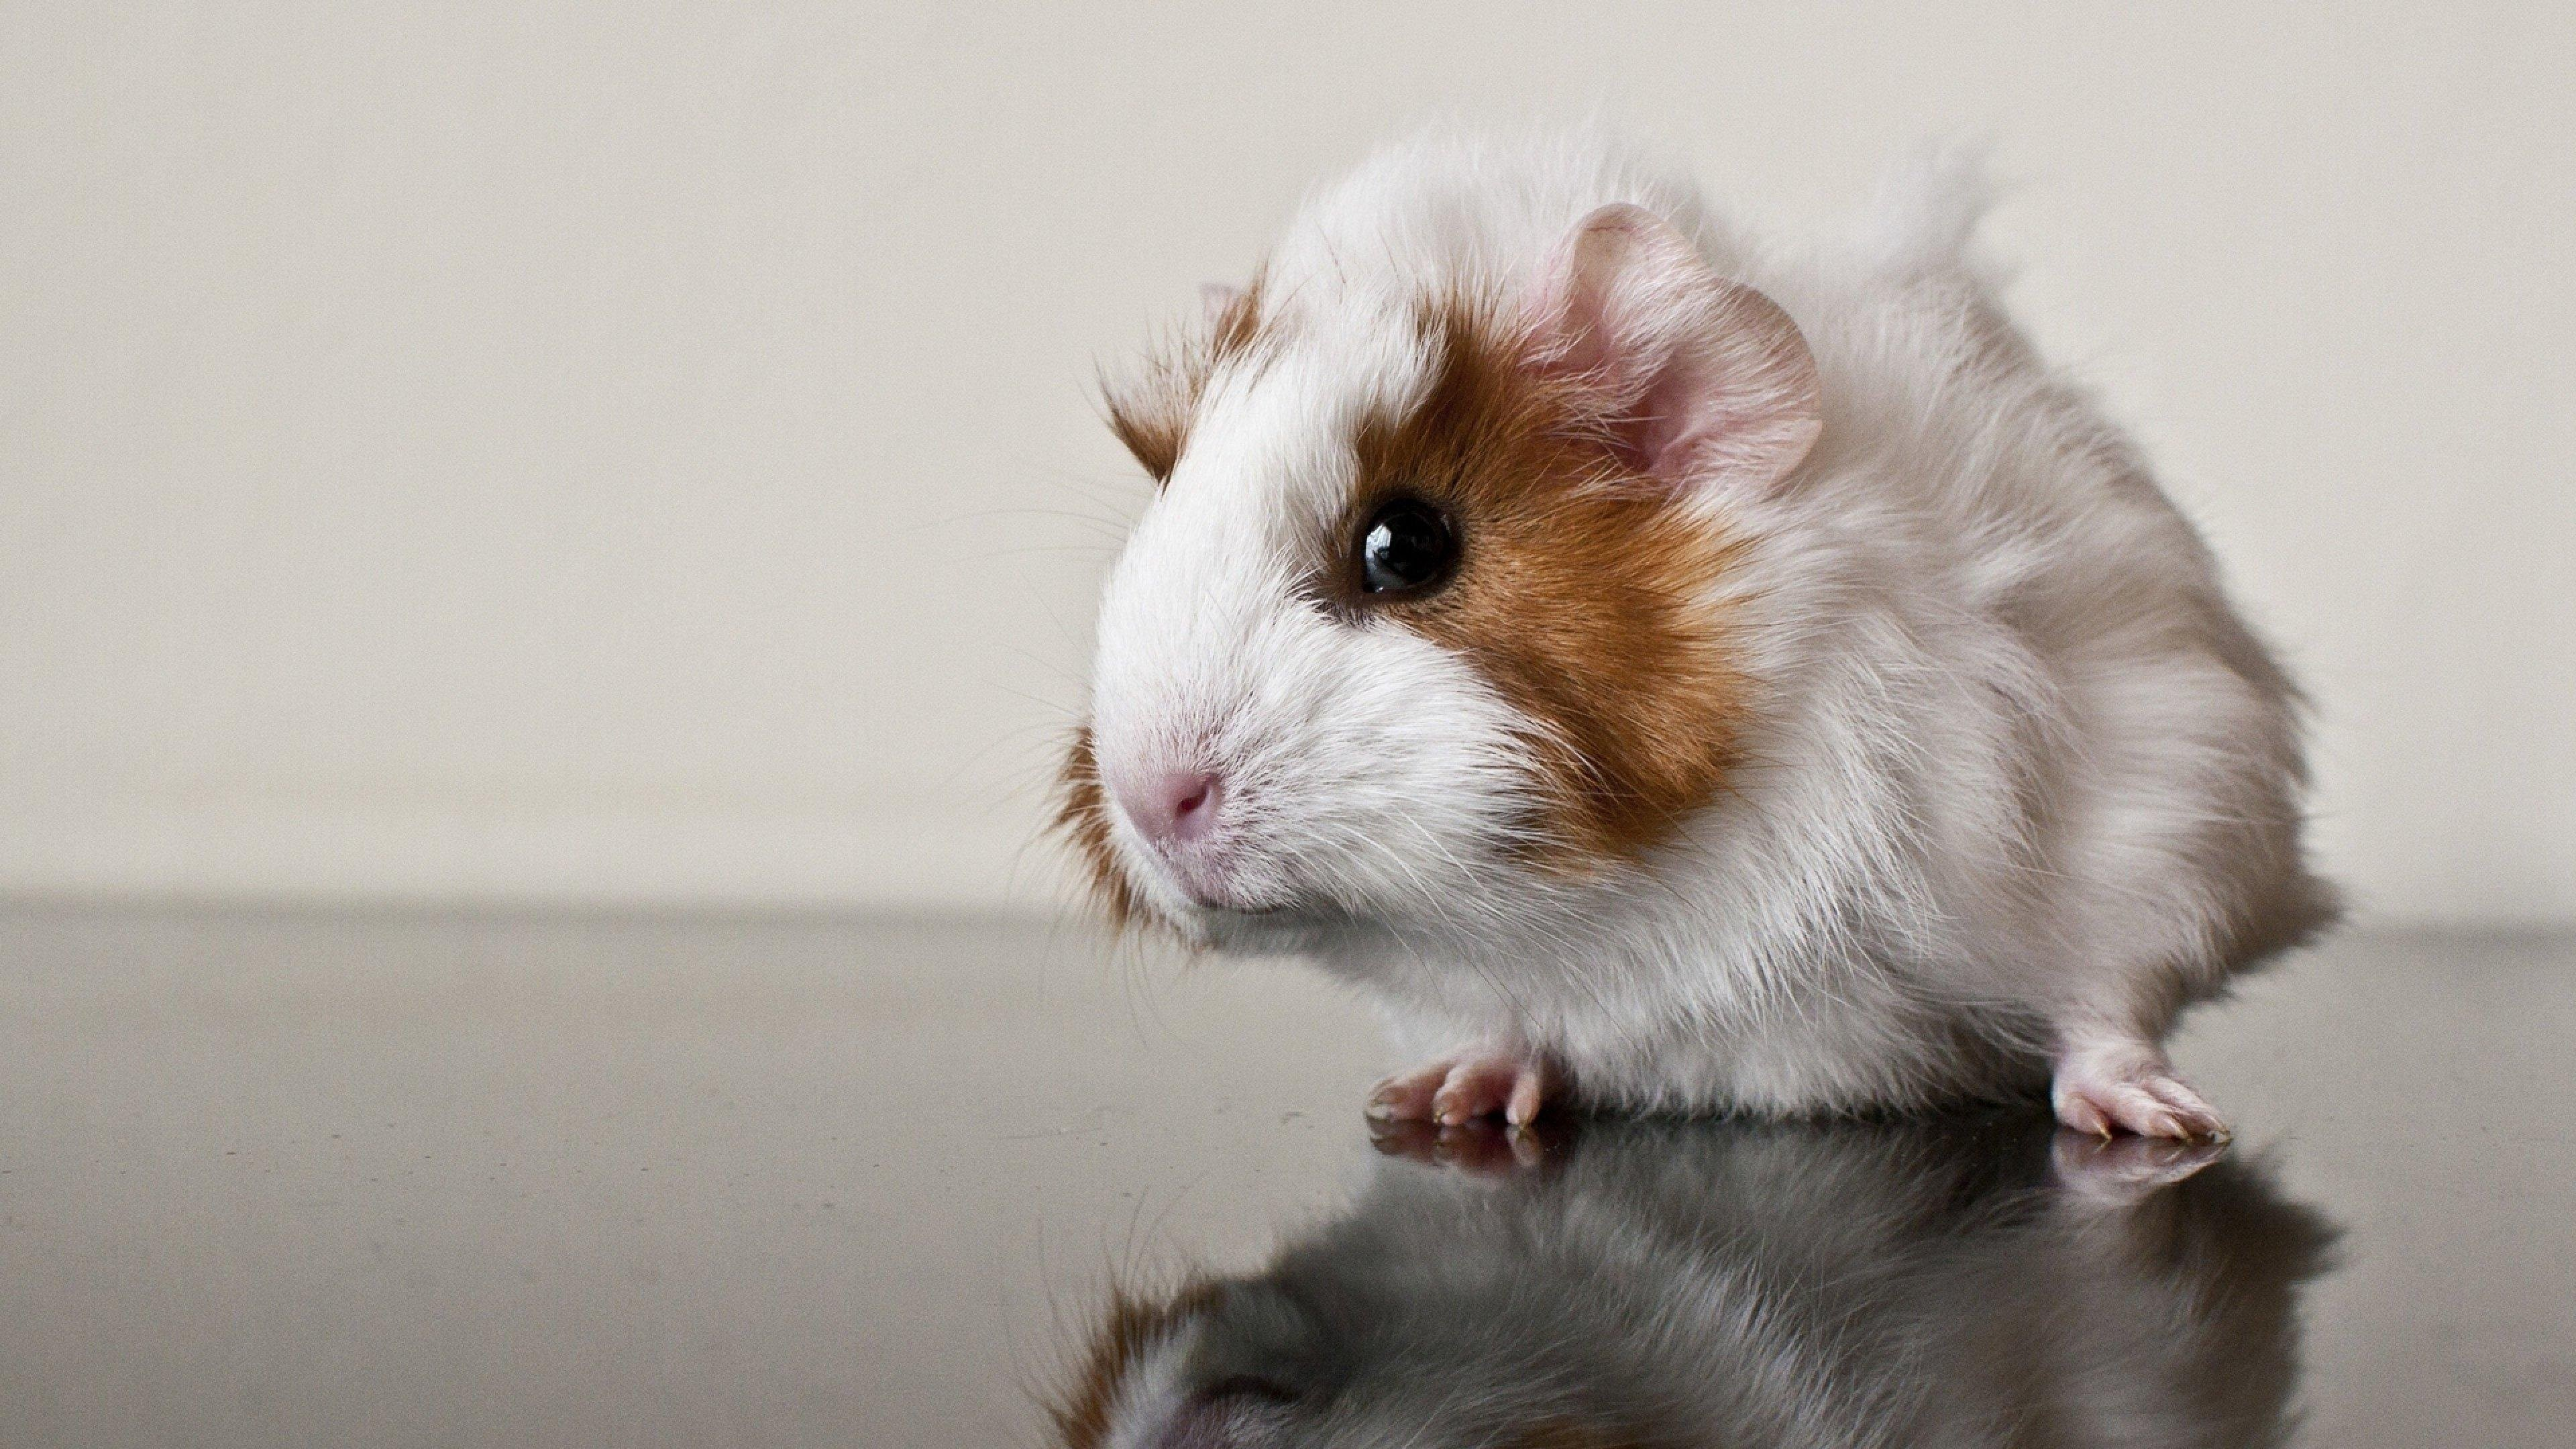 Res: 3840x2160, 4K UHD 16:9 Guinea pig, Hamster, Rat Wallpaper : Animals Wallpaper for  Phone & Desktop Backgrounds Collections